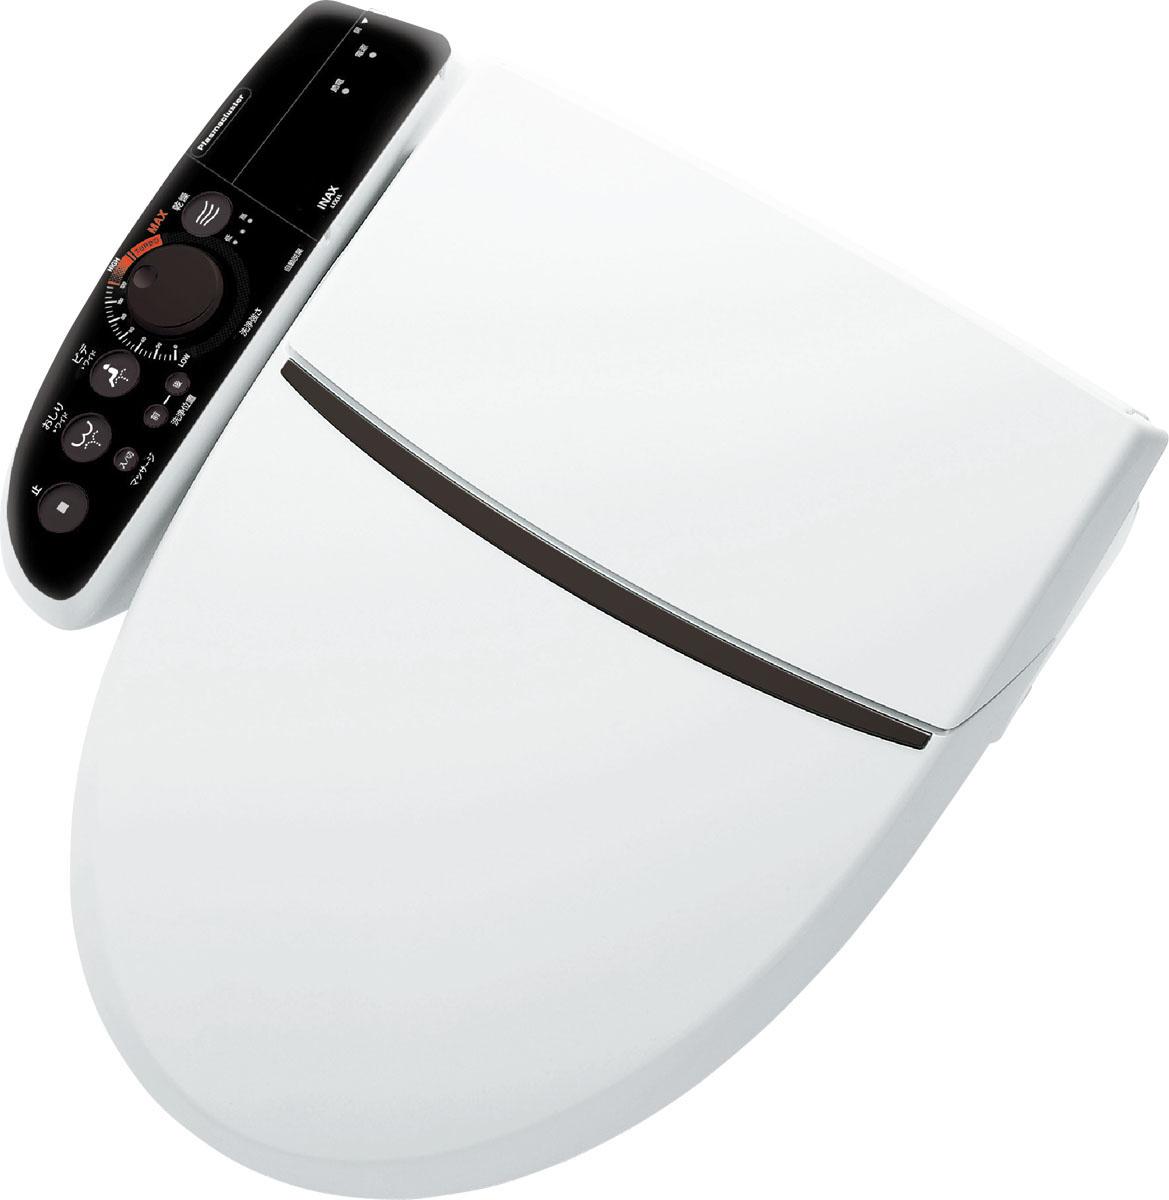 LIXIL INAX シャワートイレ K45A Kシリーズ エクストラ (フルオート便器洗浄なし)CW-K45A